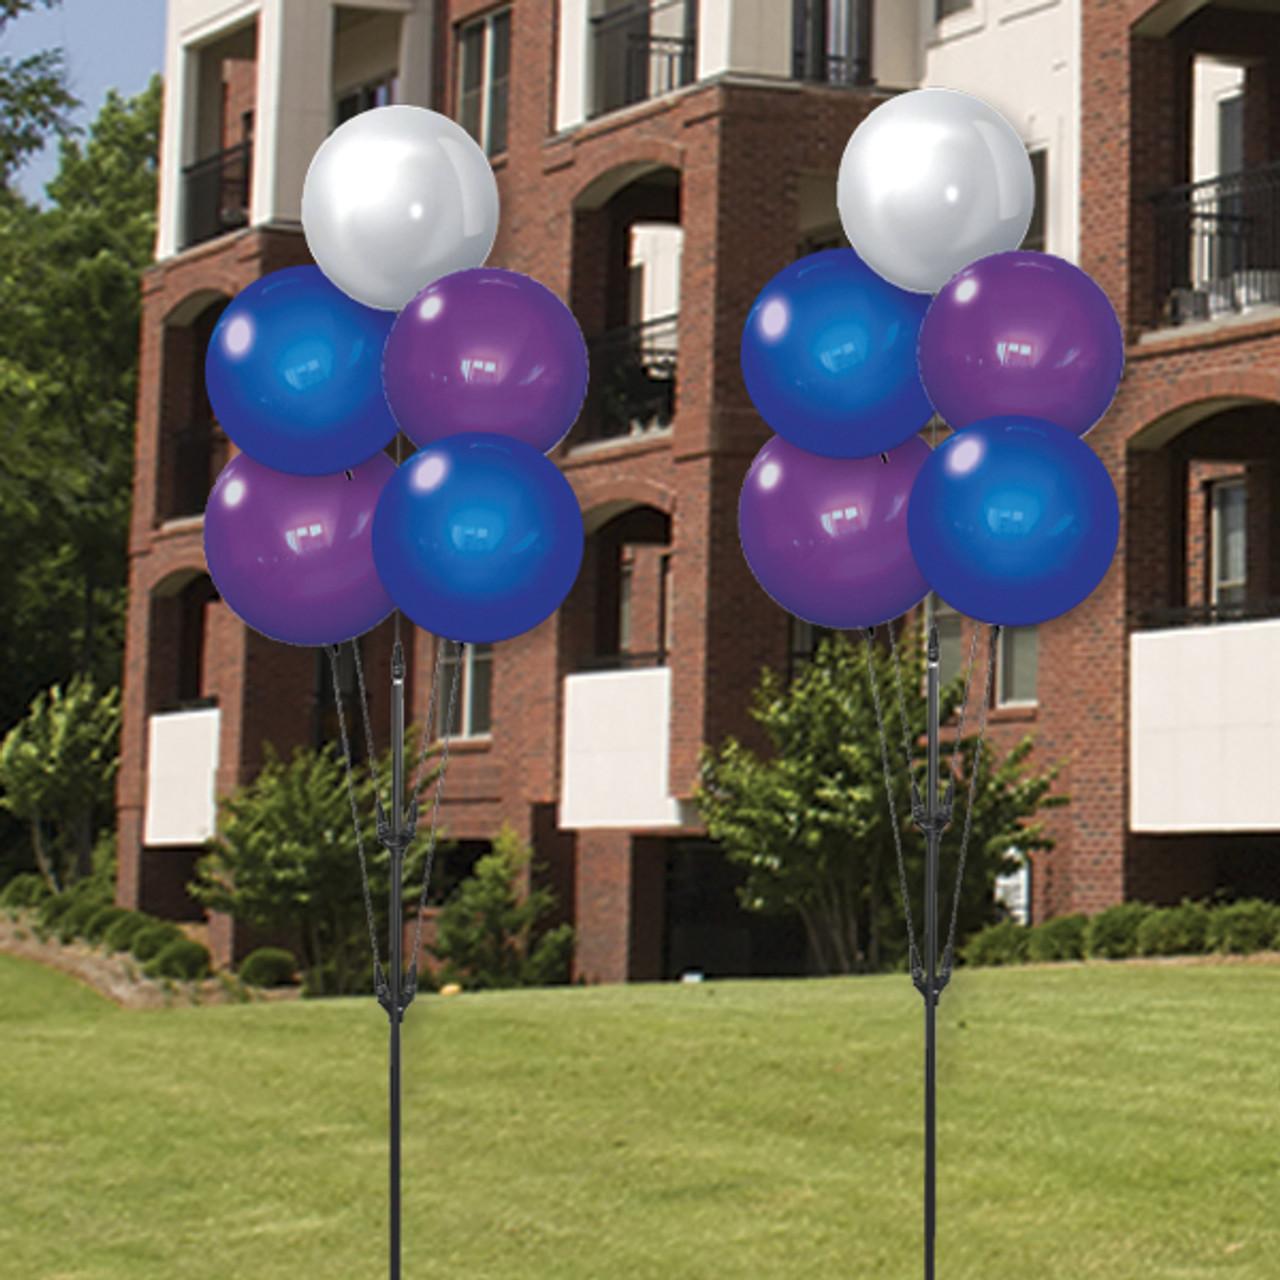 Helium Free Reusable Balloons Dura-Bonker Quintet - Sapphire Skies- ITEM#: DBQ28